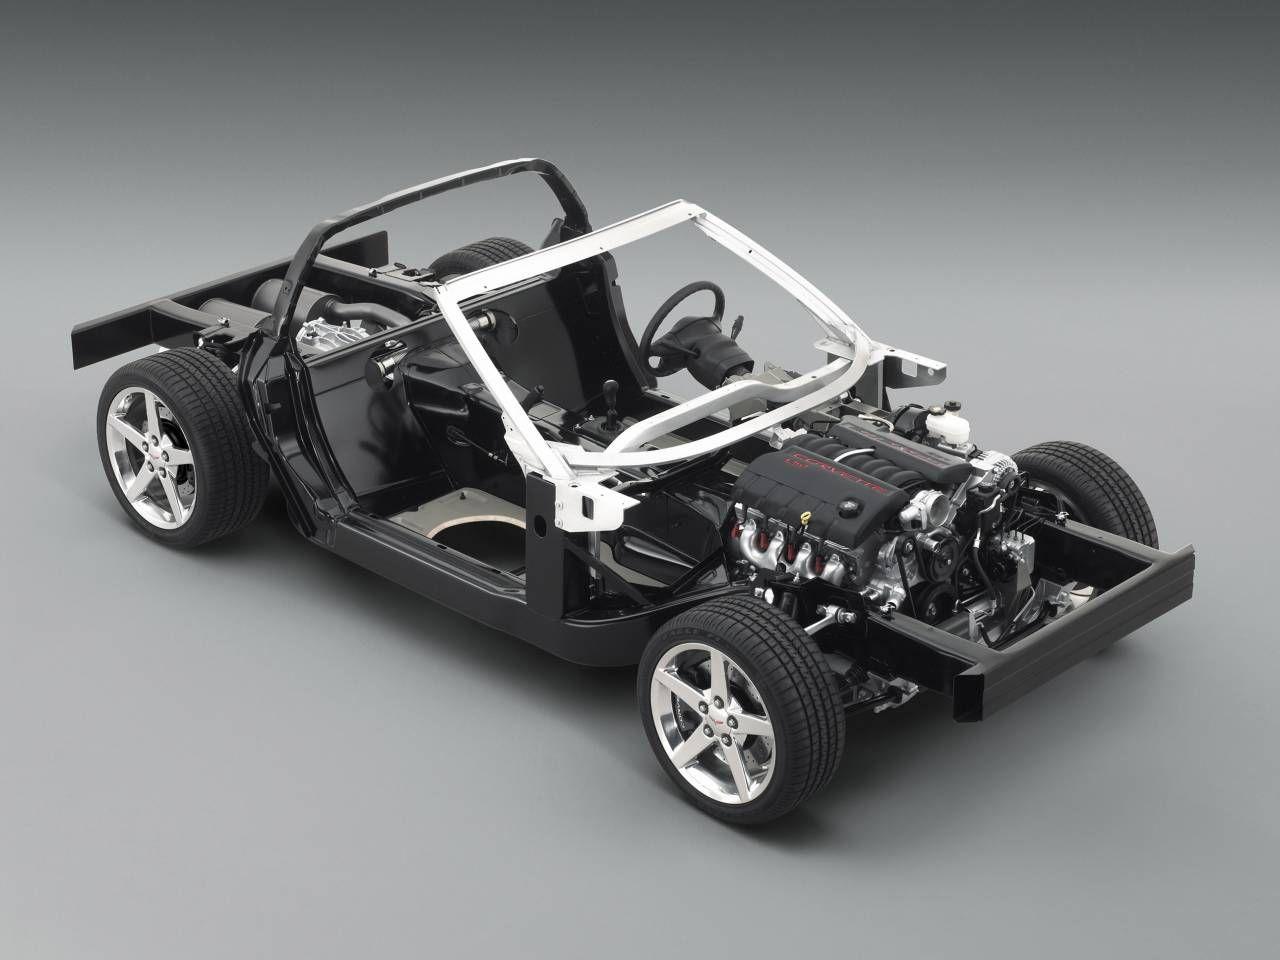 Chassis - Frame | car | Pinterest | Cars